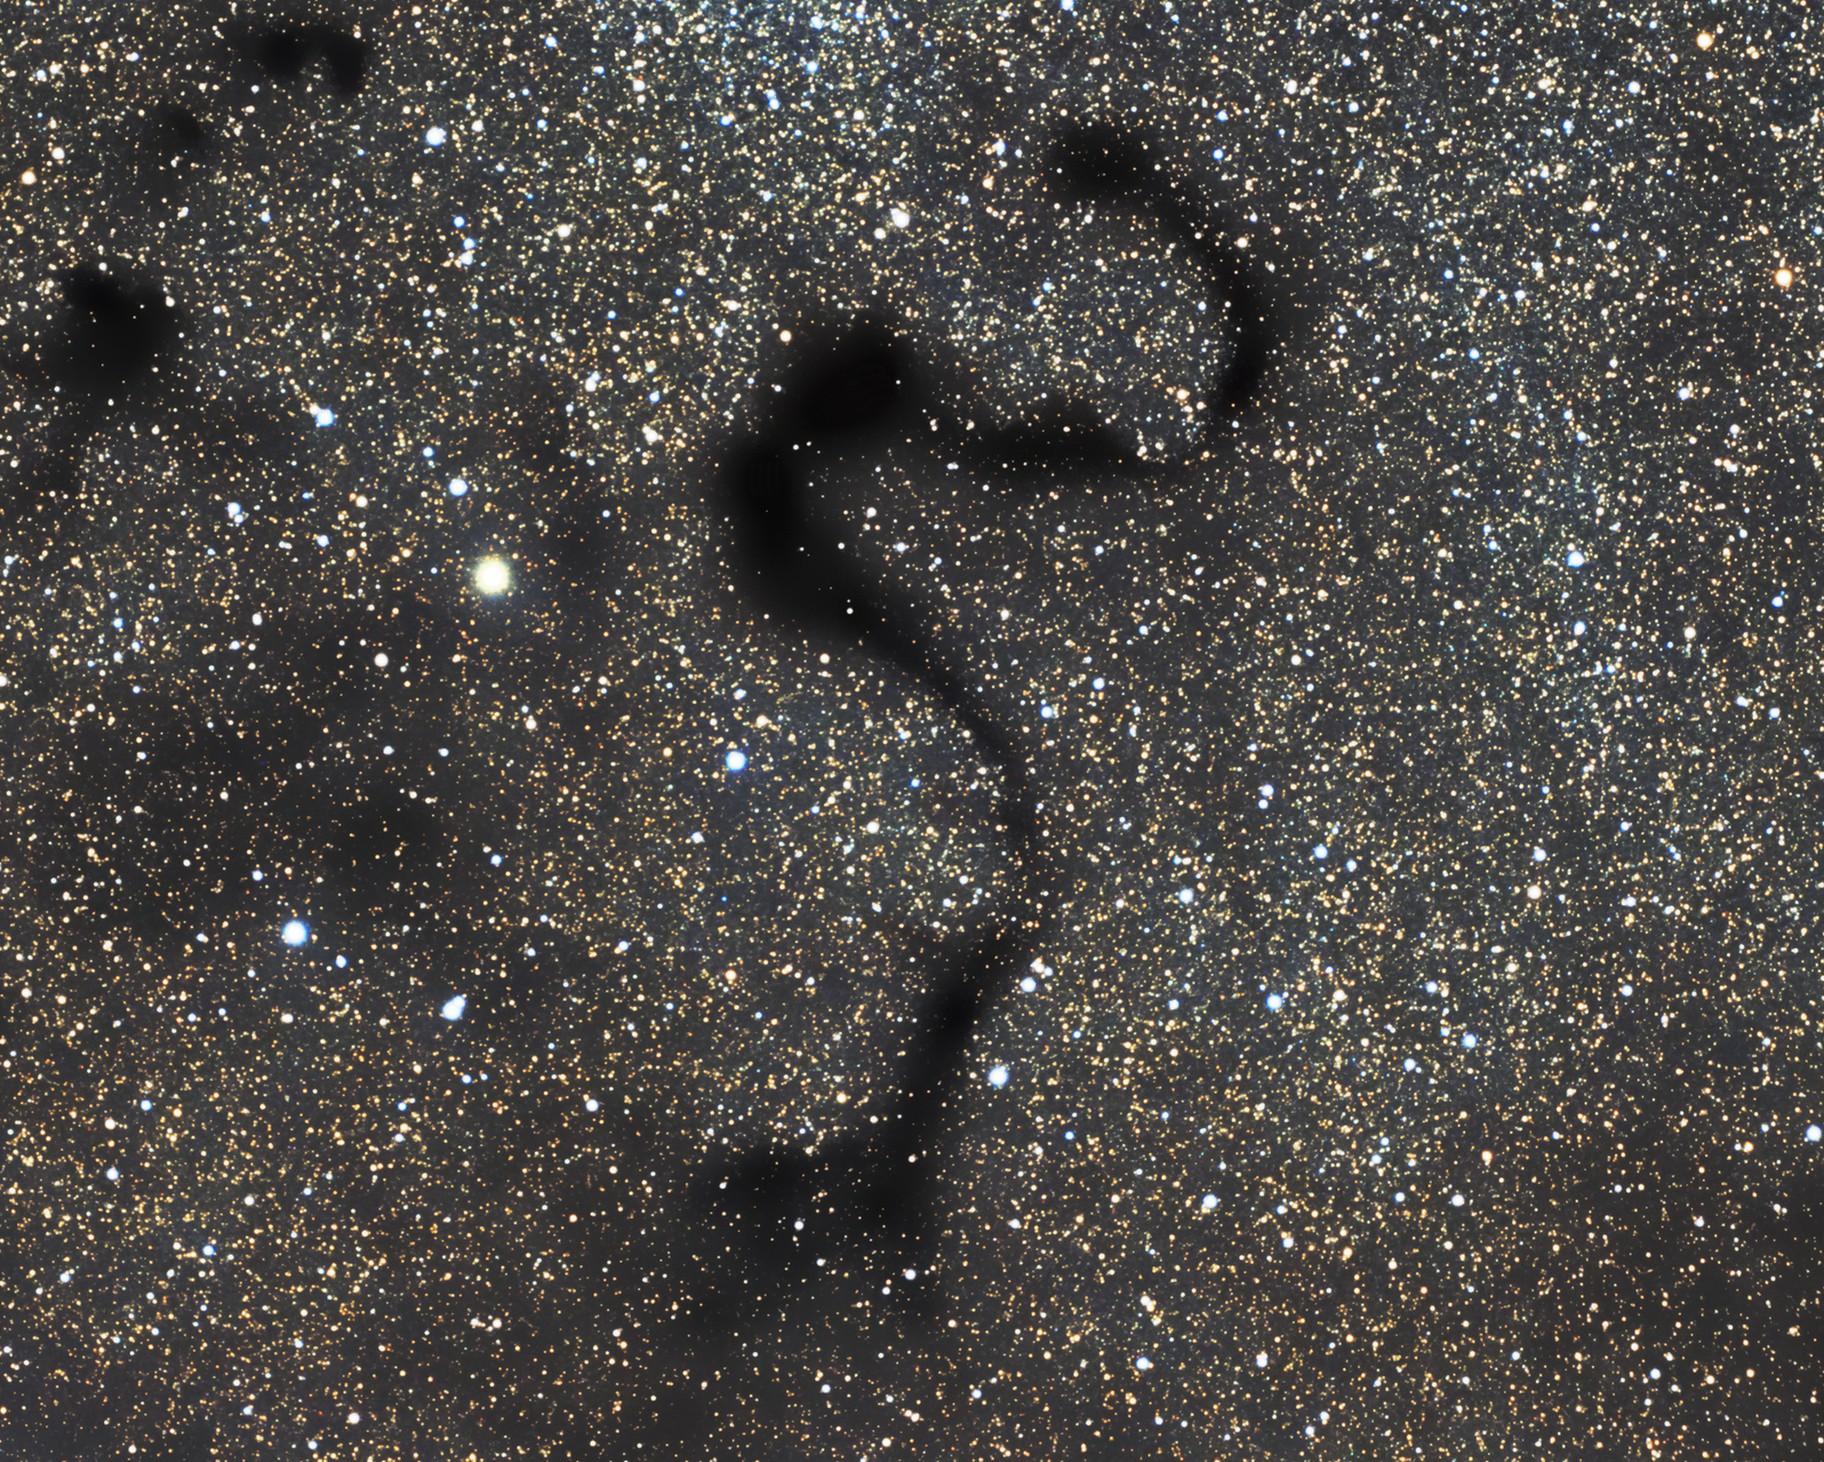 SNAKE NEBULA, THE BLACK SNAKE IN THE SPACE